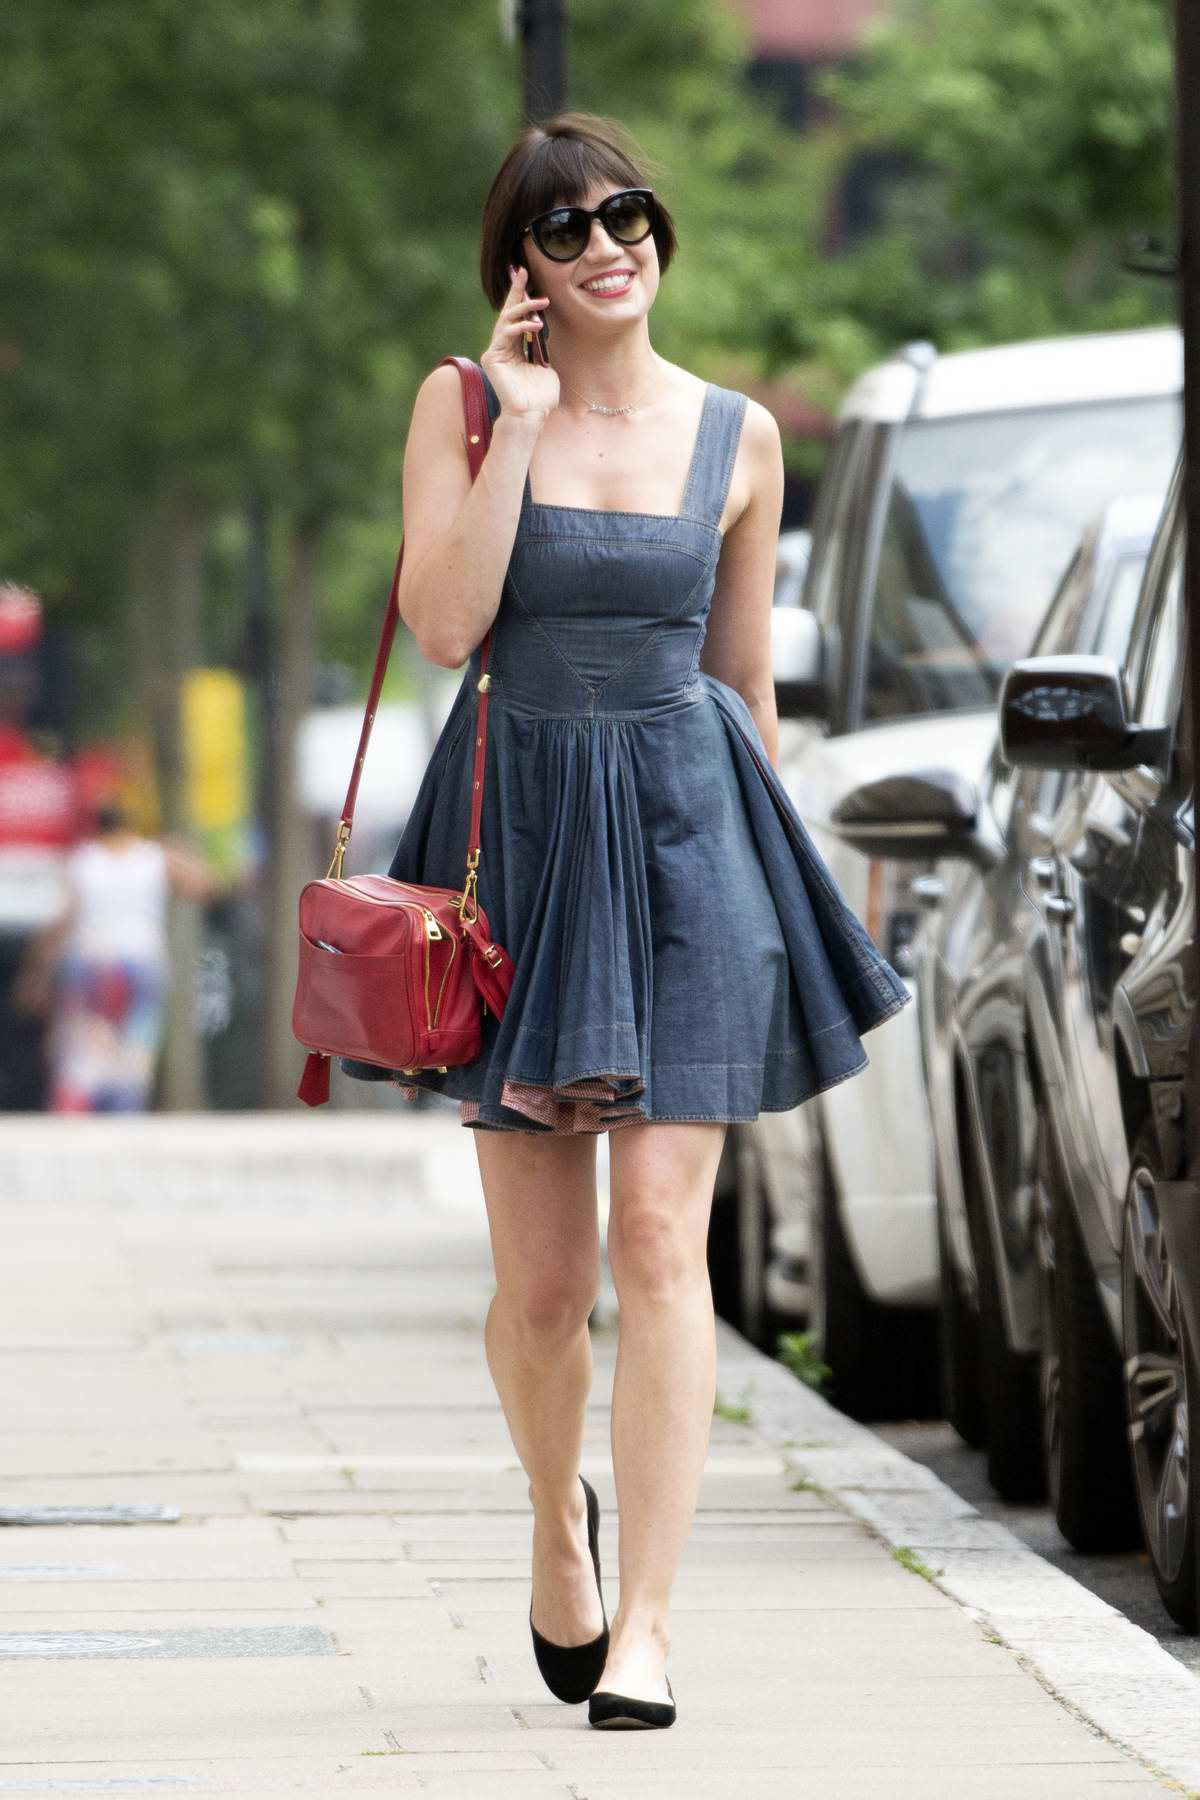 6b8f6f7f7 Short Hair And Long Dresses | Lixnet AG